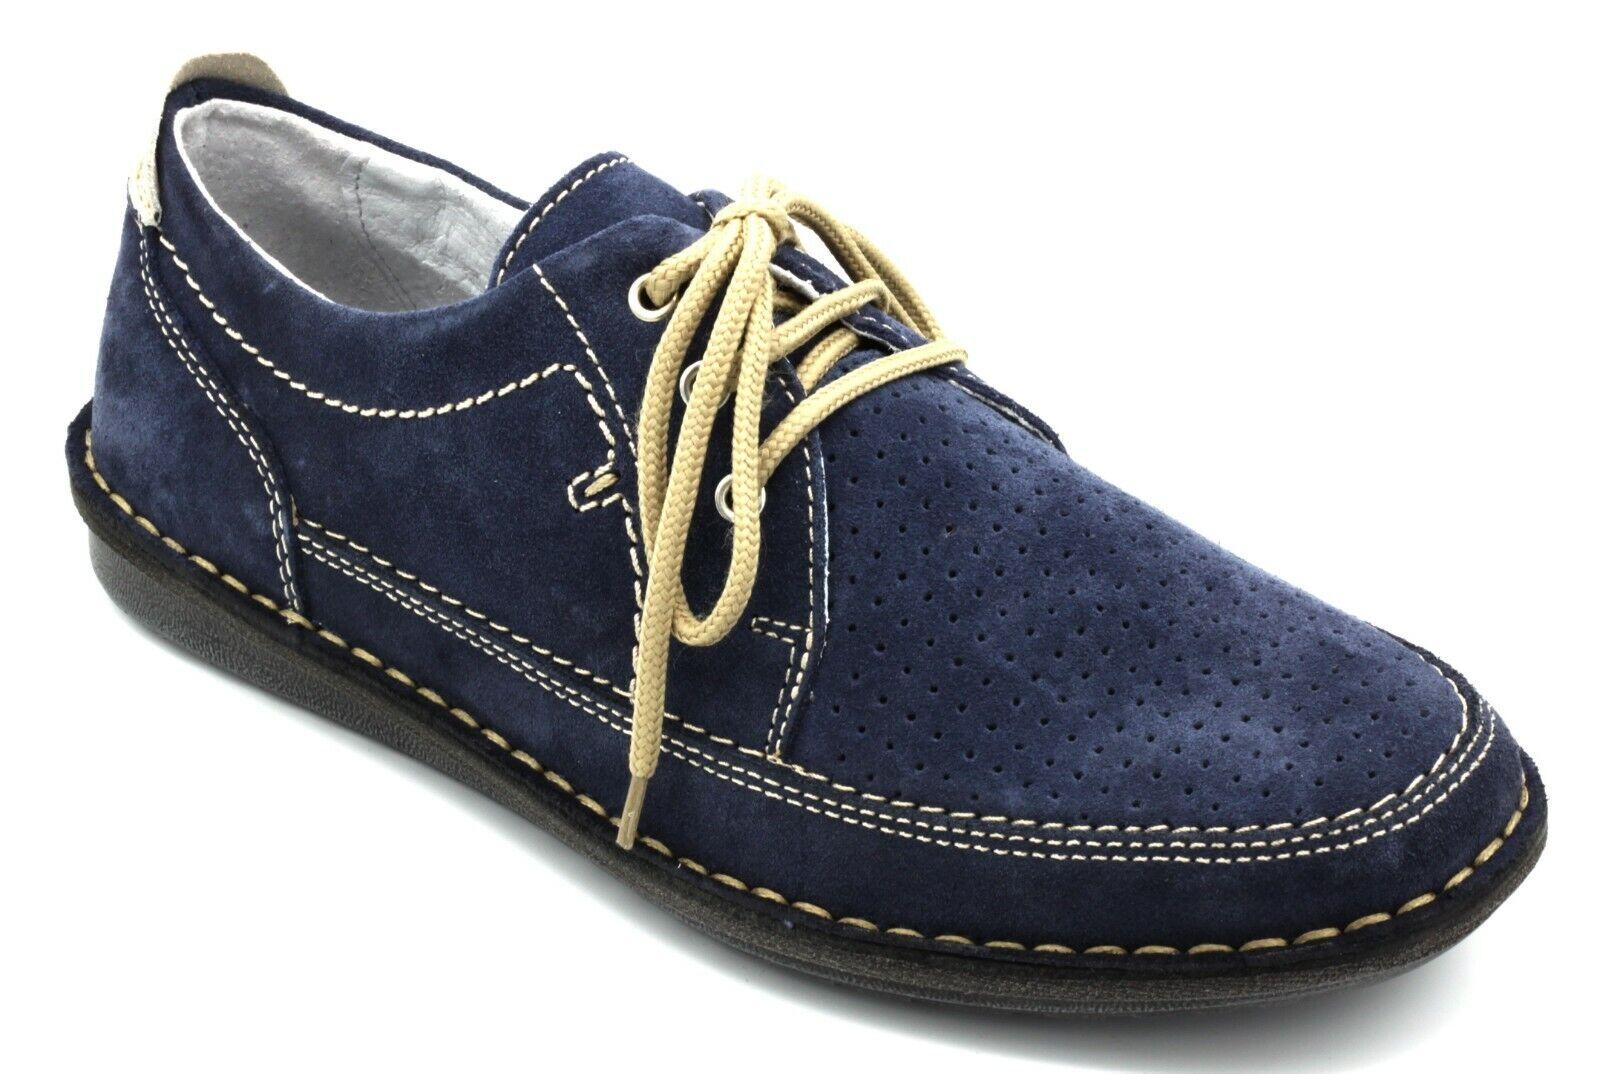 VALLEverde zapatos hombres ALLACCIATE  IN PELLE NABUK ColorE azul MODA CASUAL n. 45